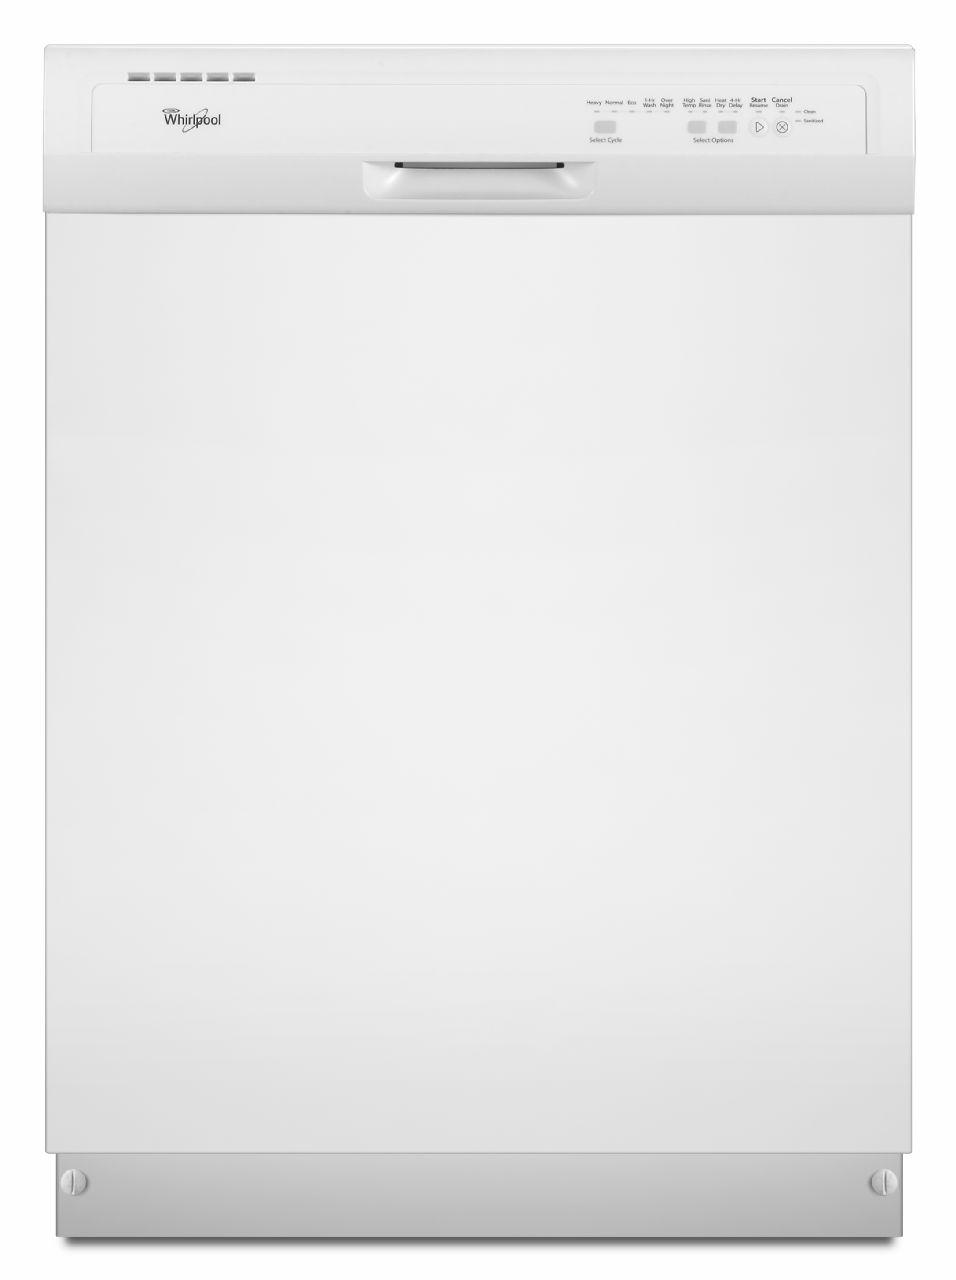 Whirlpool Dishwasher Model WDF510PAYWA Parts